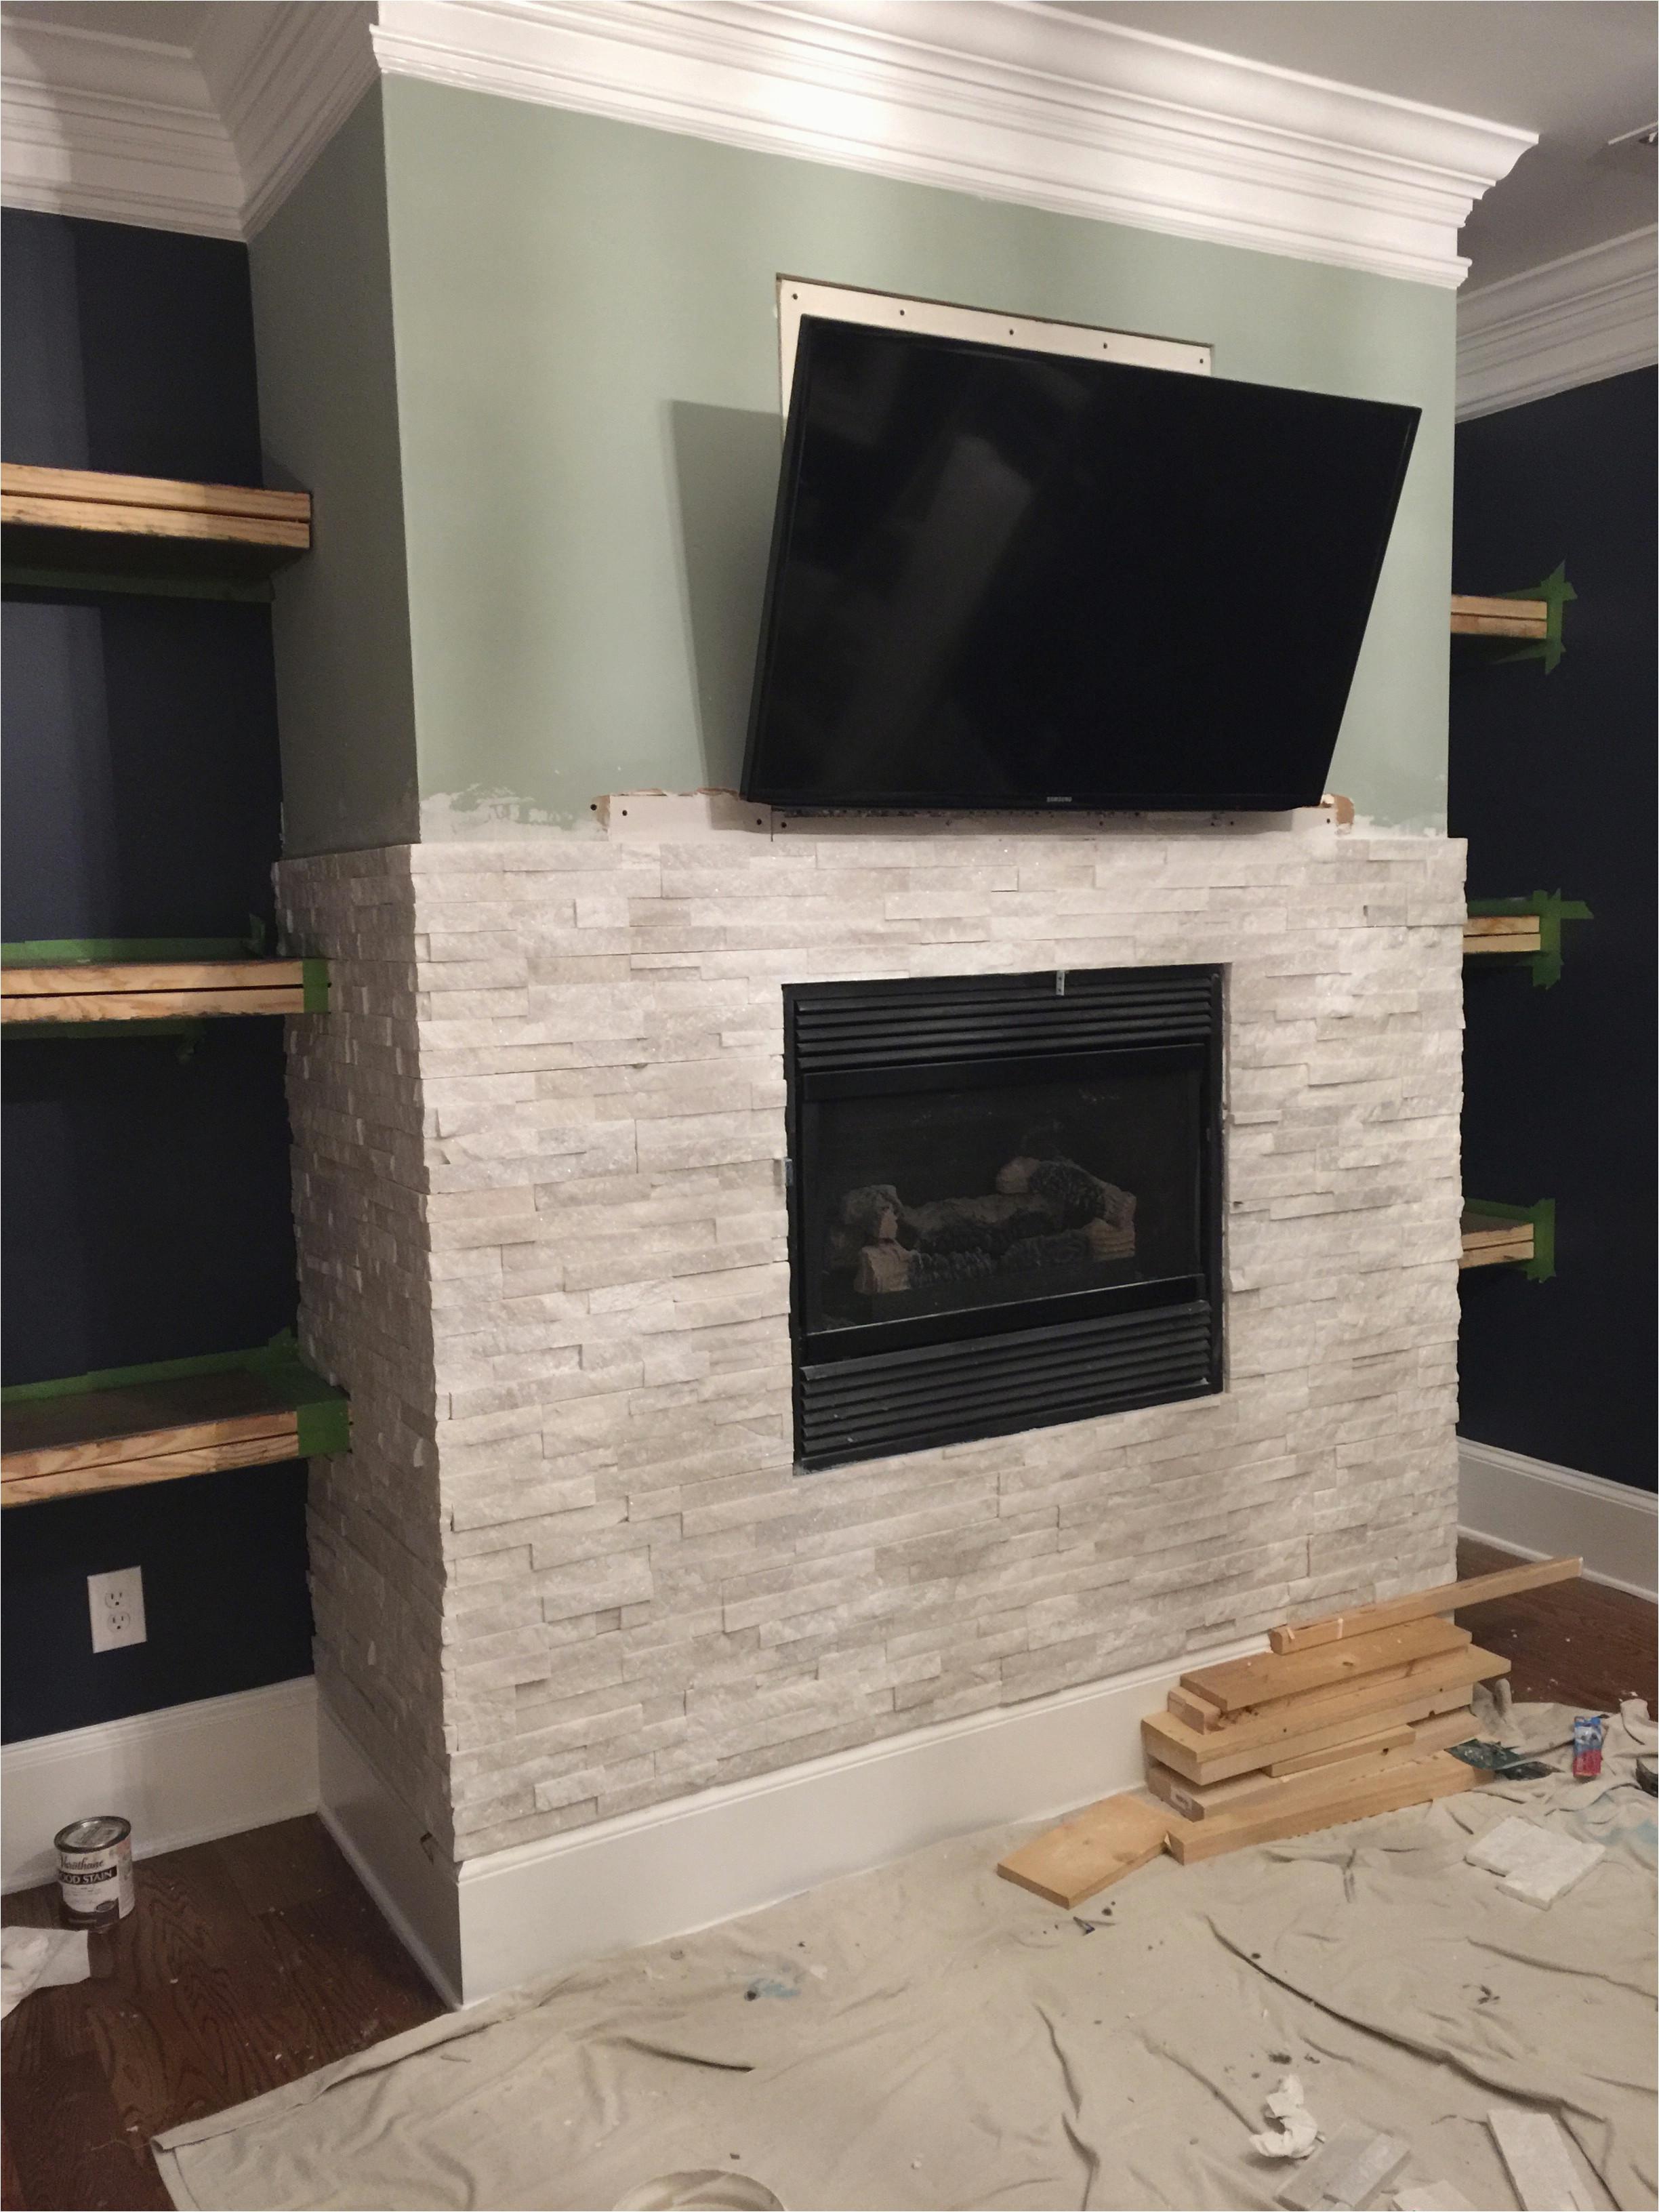 diy paint brick fireplace lovely gray brick fireplace and mesmerizing grey brick fireplace and of diy paint brick fireplace